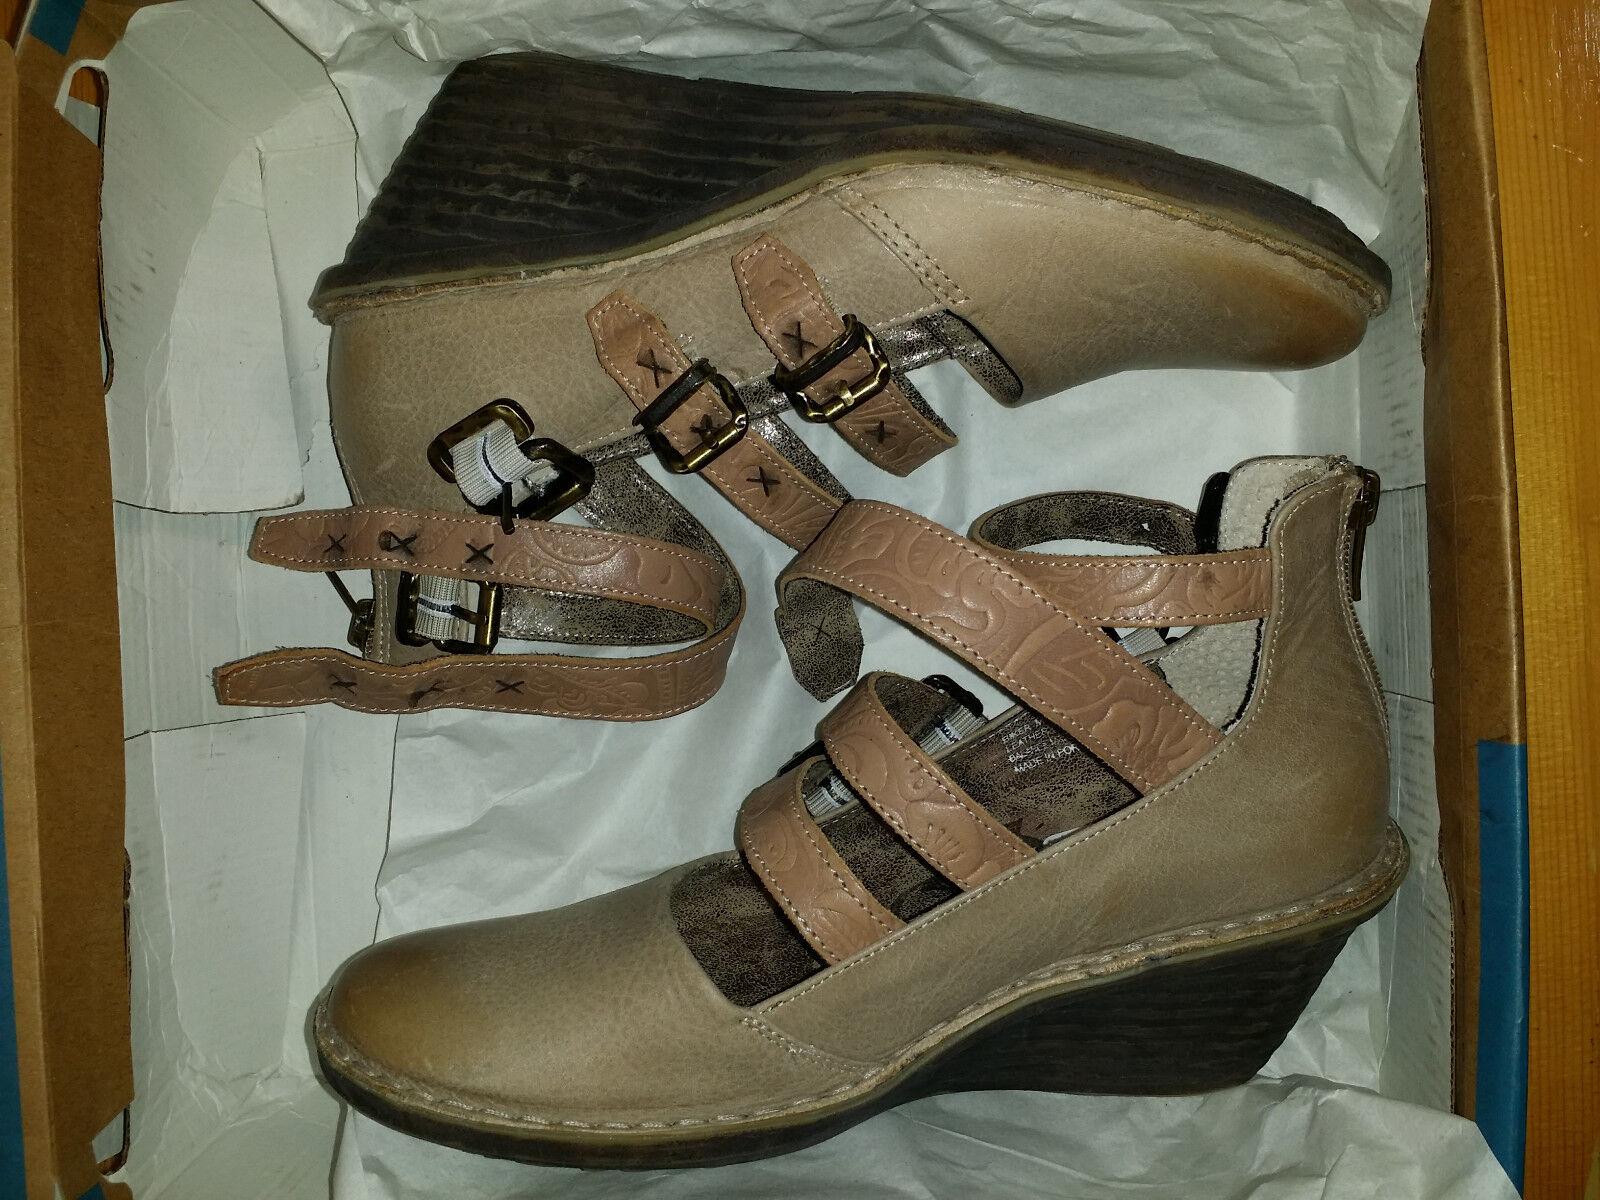 140 NEW Womens 6.5M 6.5M 6.5M EUR 37 OTBT Mary Jane Biker Wedge Sandals Pecan ea5799